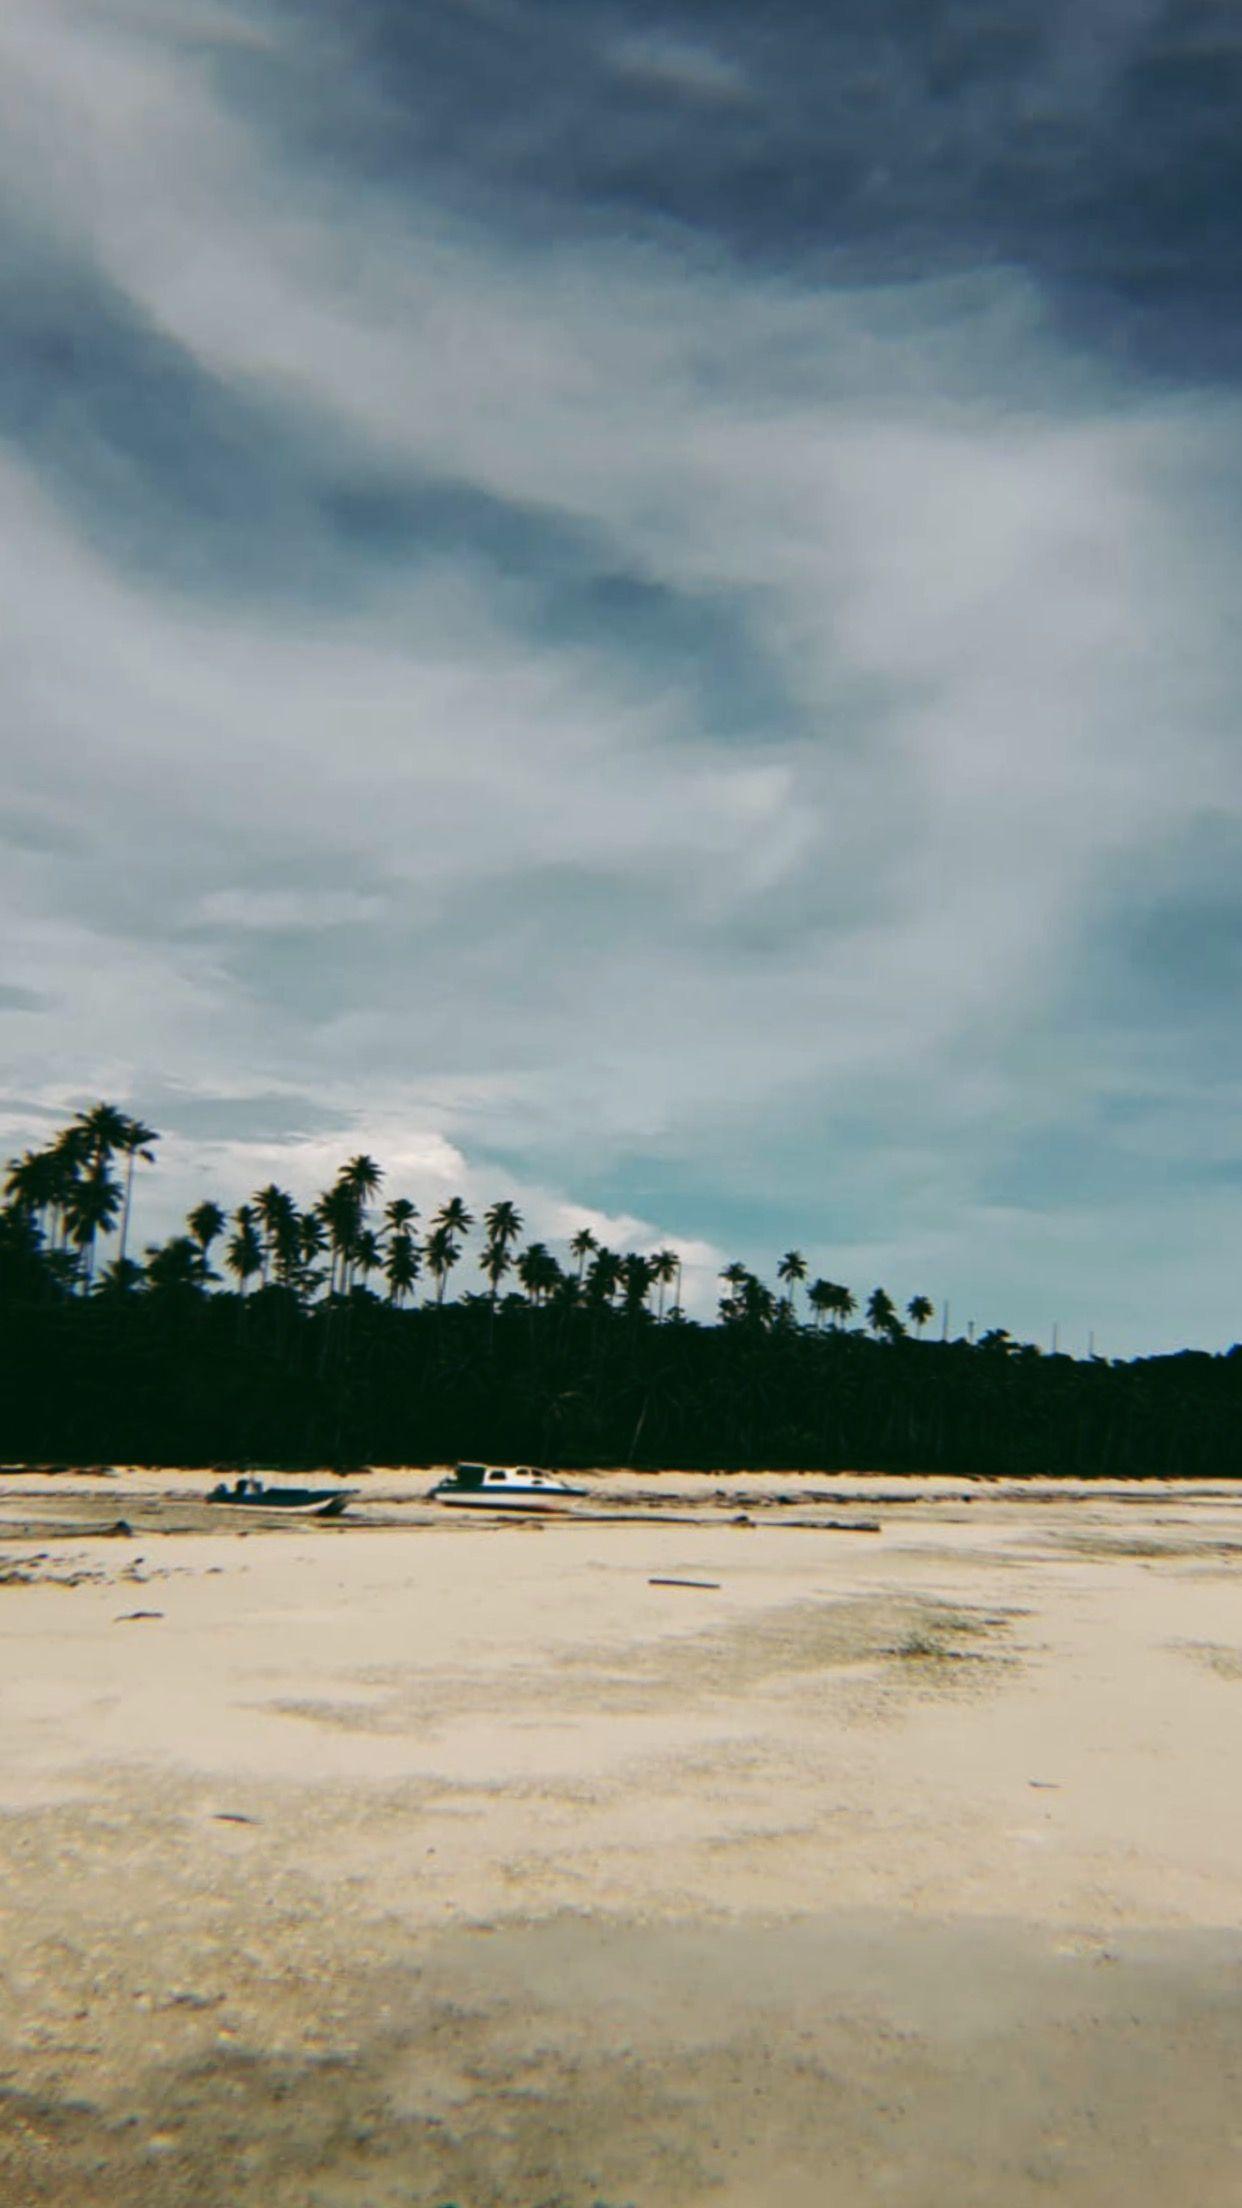 [ 8 Juni 2019 ] Pulau Maratua, Kalimantan Timur, Indonesia